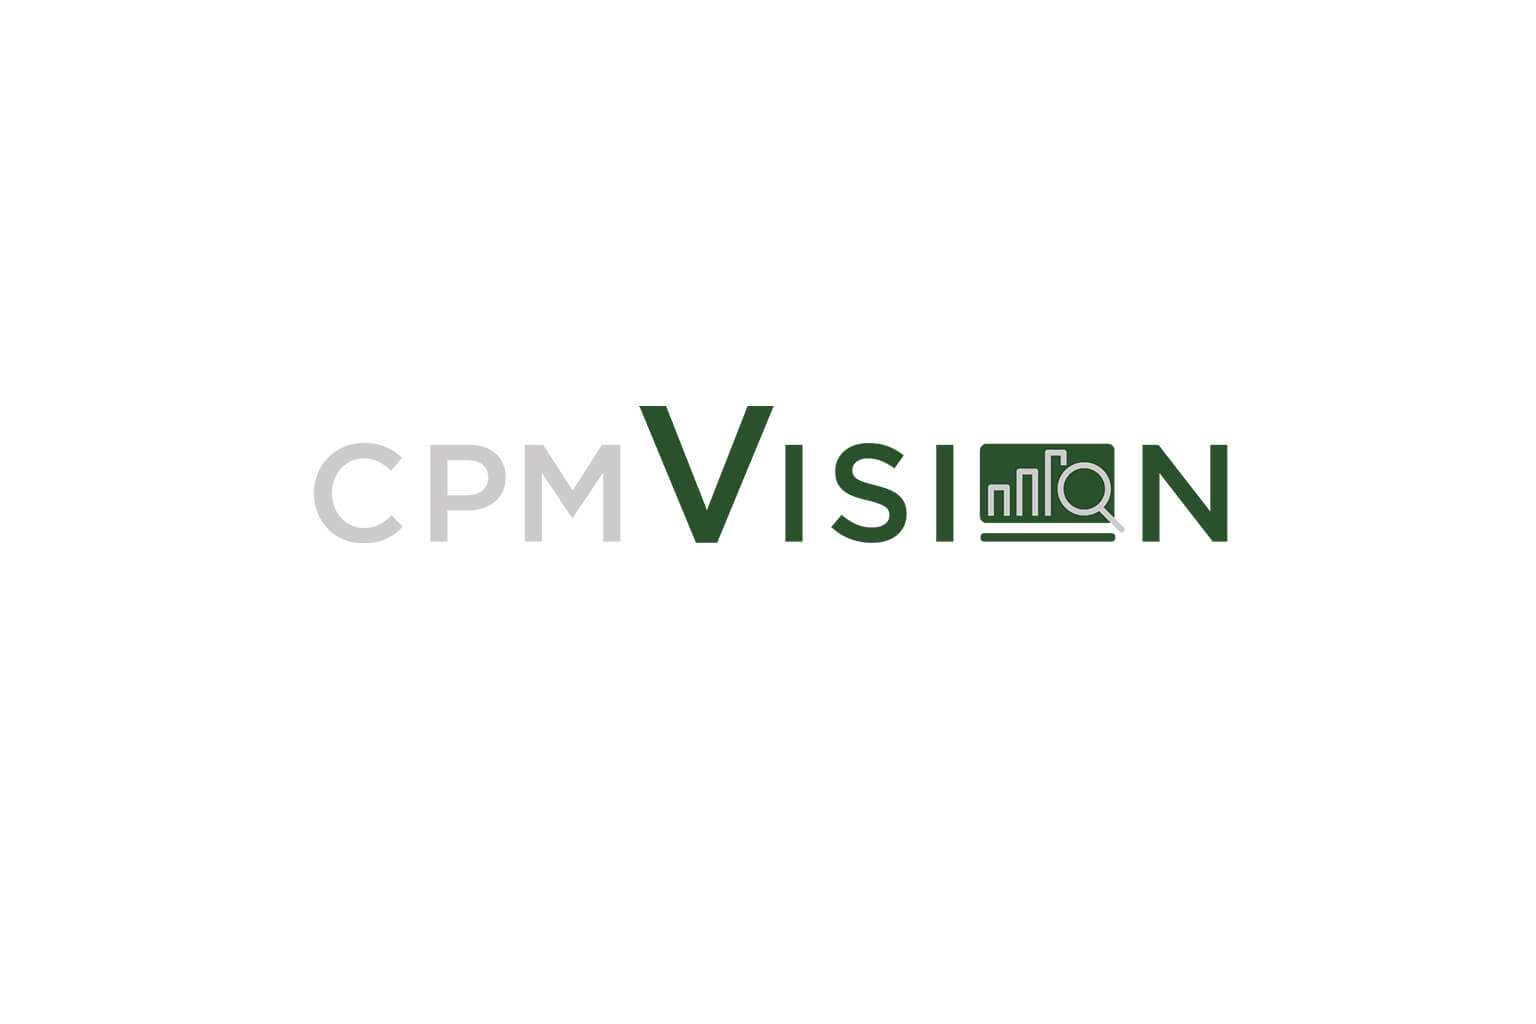 cpmVision logo